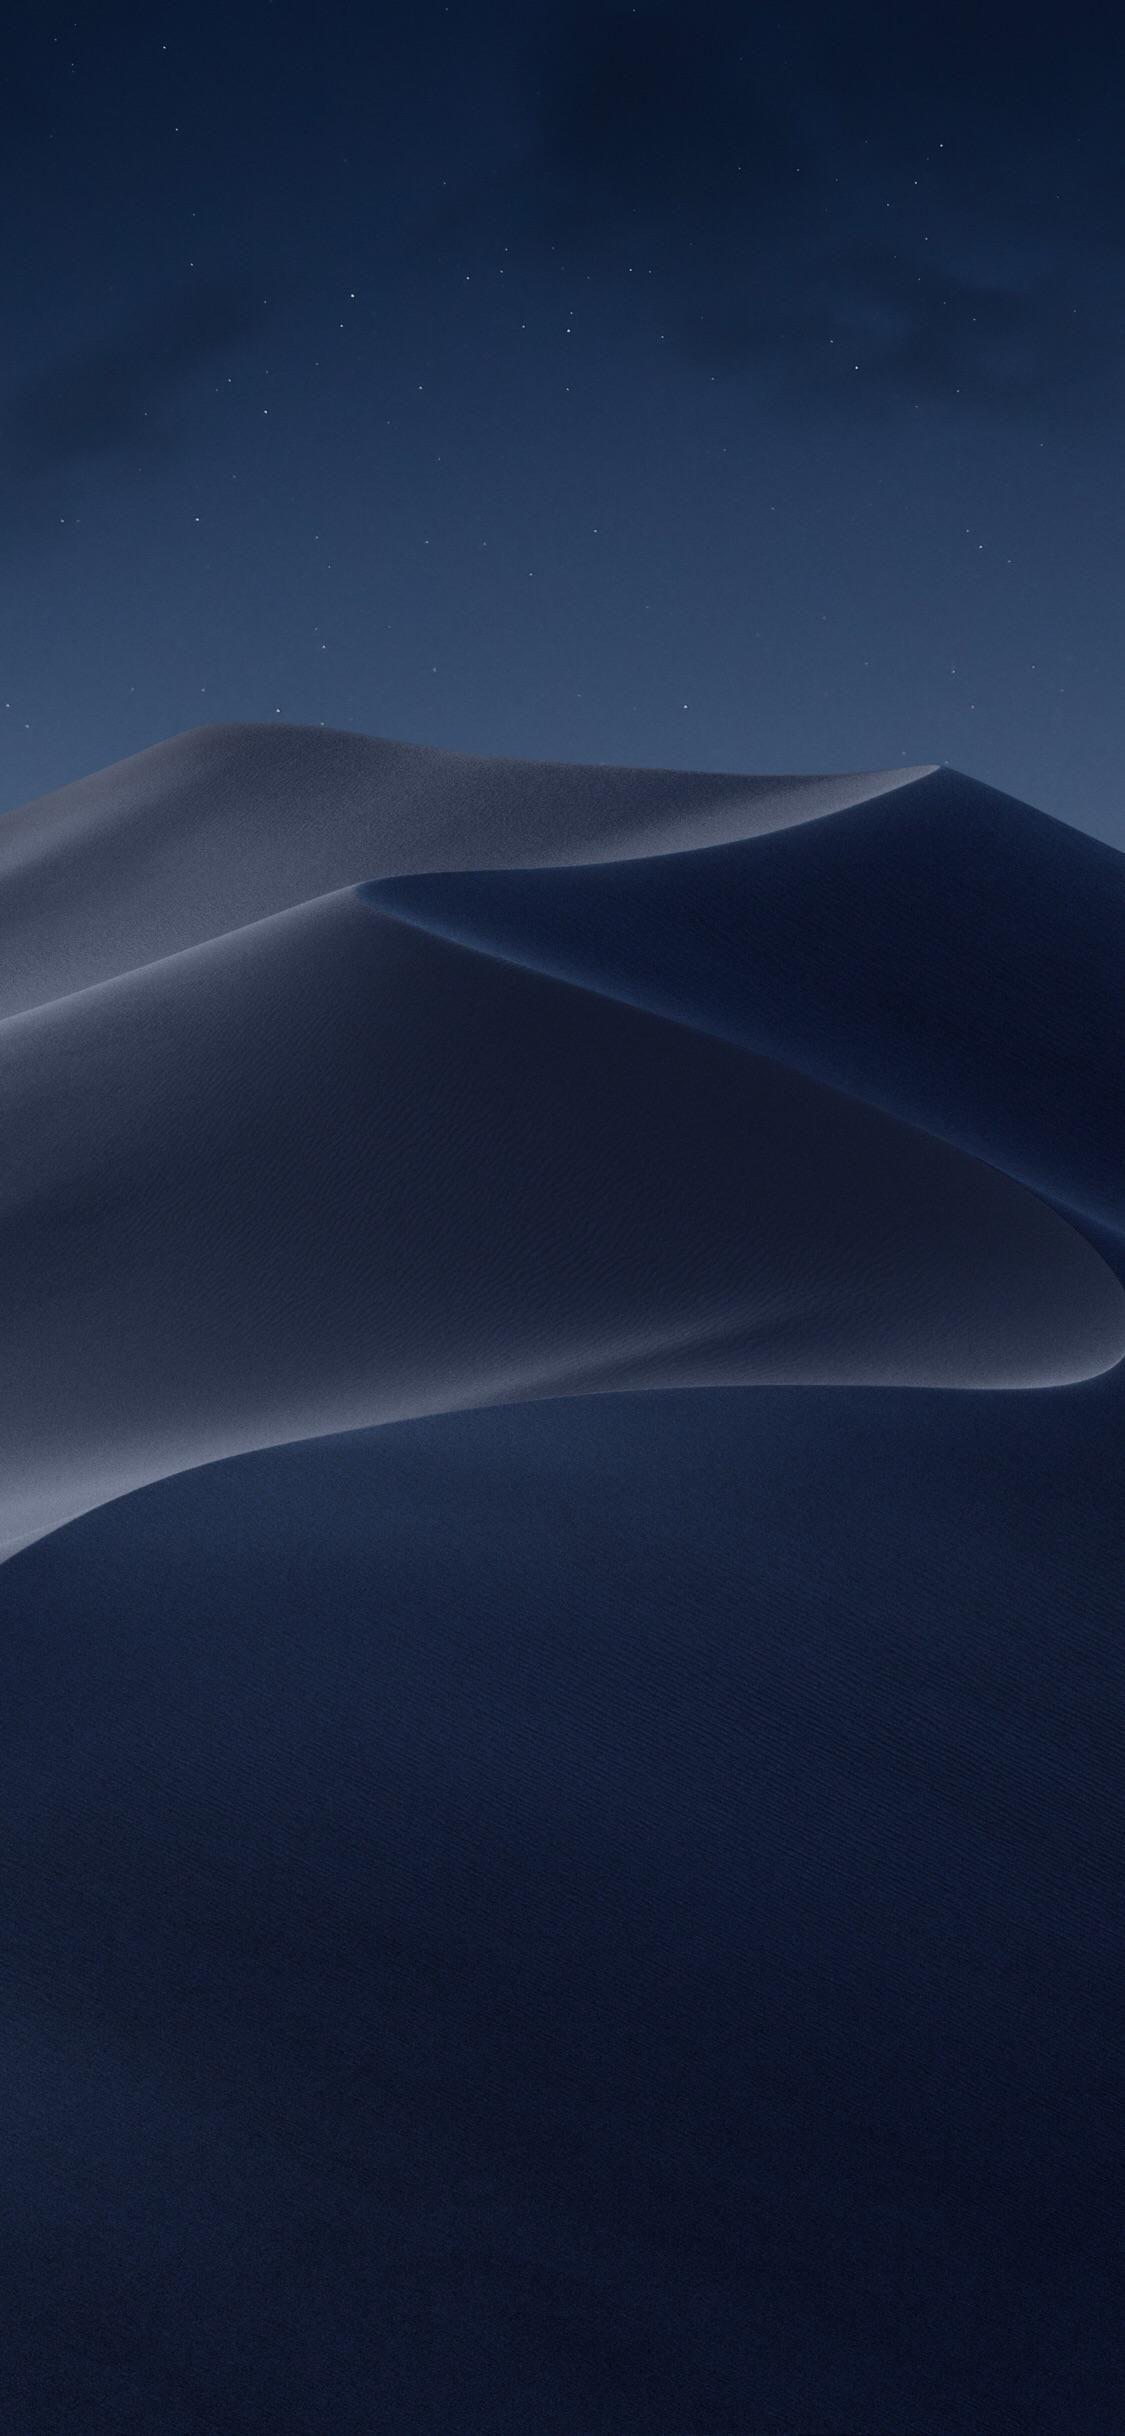 Mojave Dark Wallpaper Download at: http://www.myfavwallpaper.com/